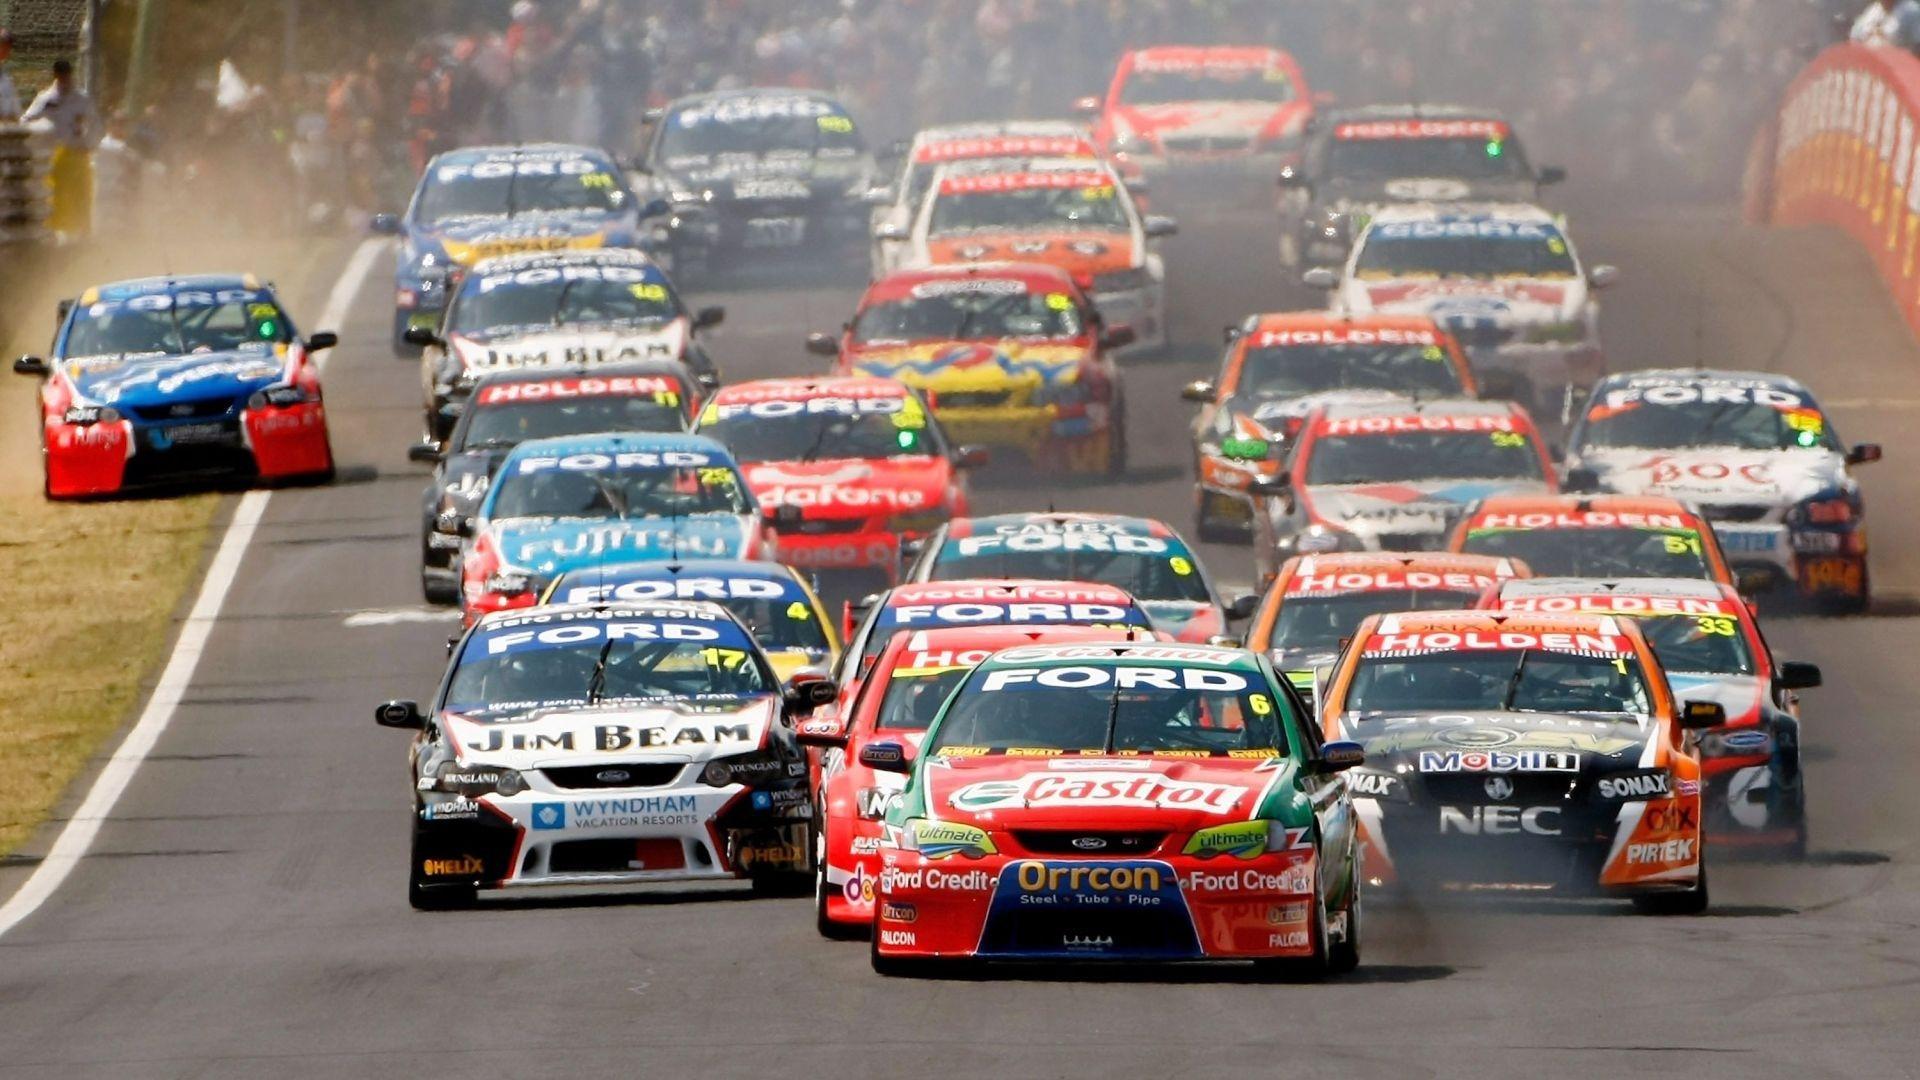 1842834 Windows Wallpaper Racing Super Cars V8 Supercars Racing